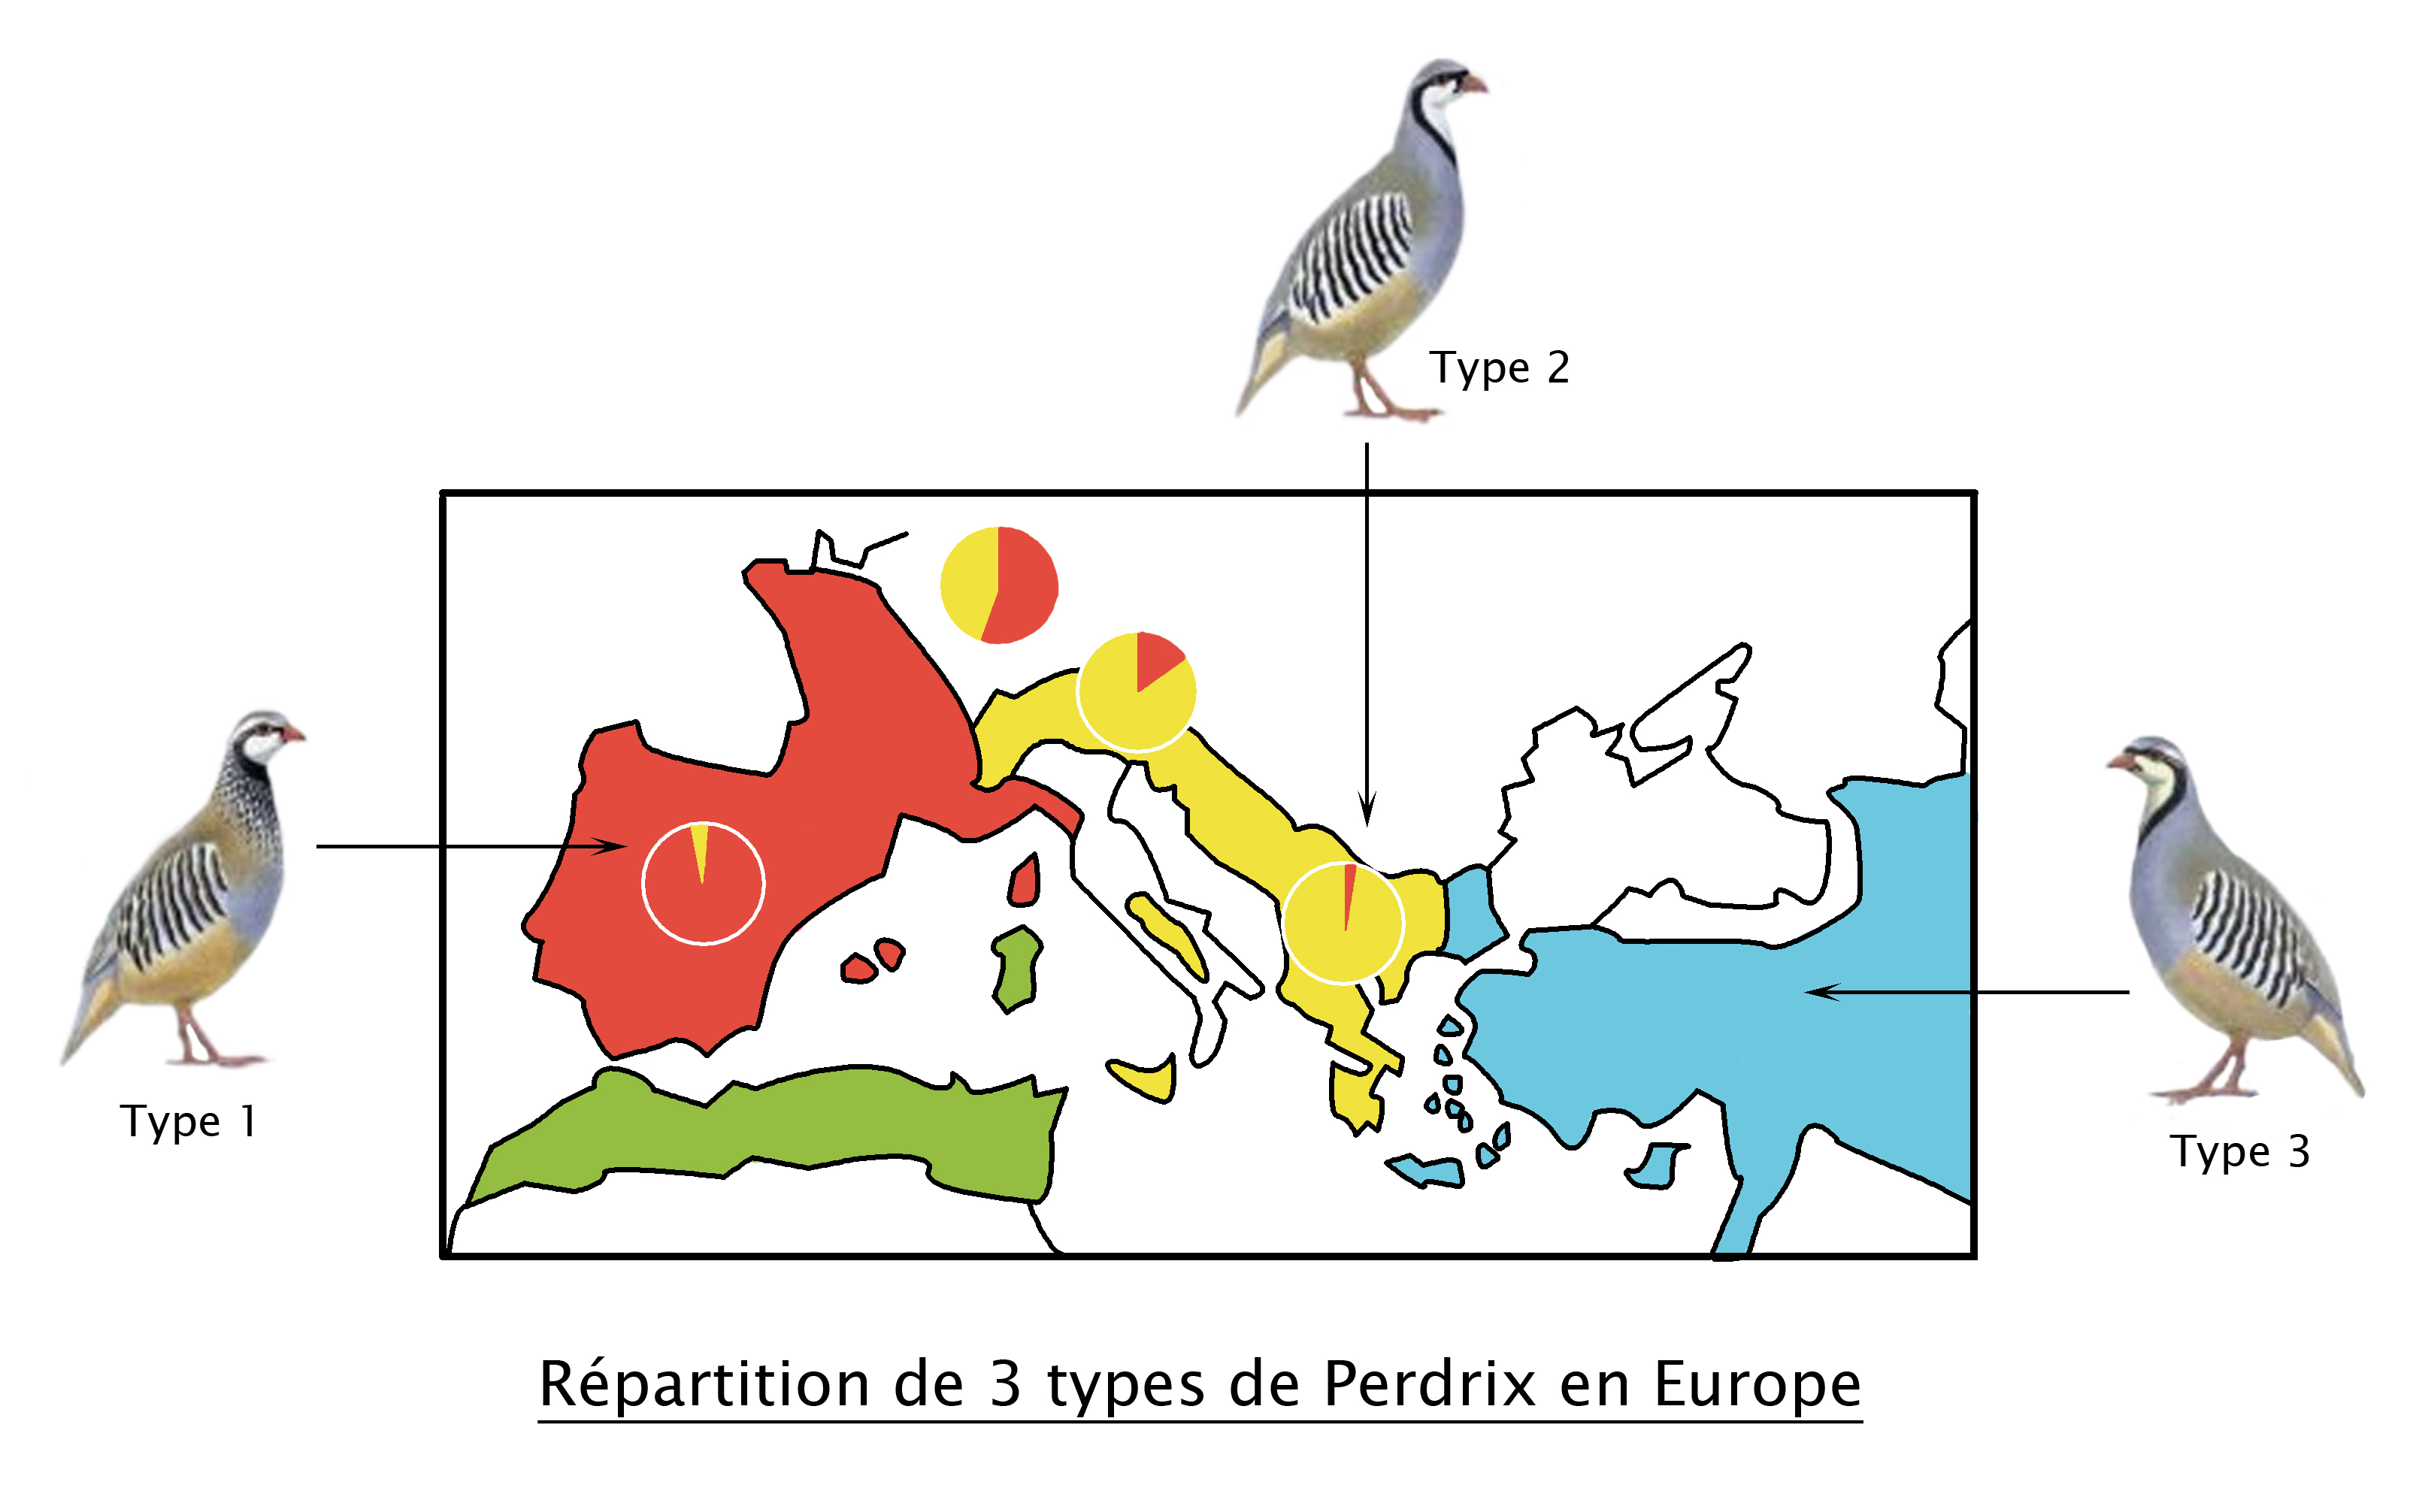 repartition_de_3_types_de_perdrix.jpg